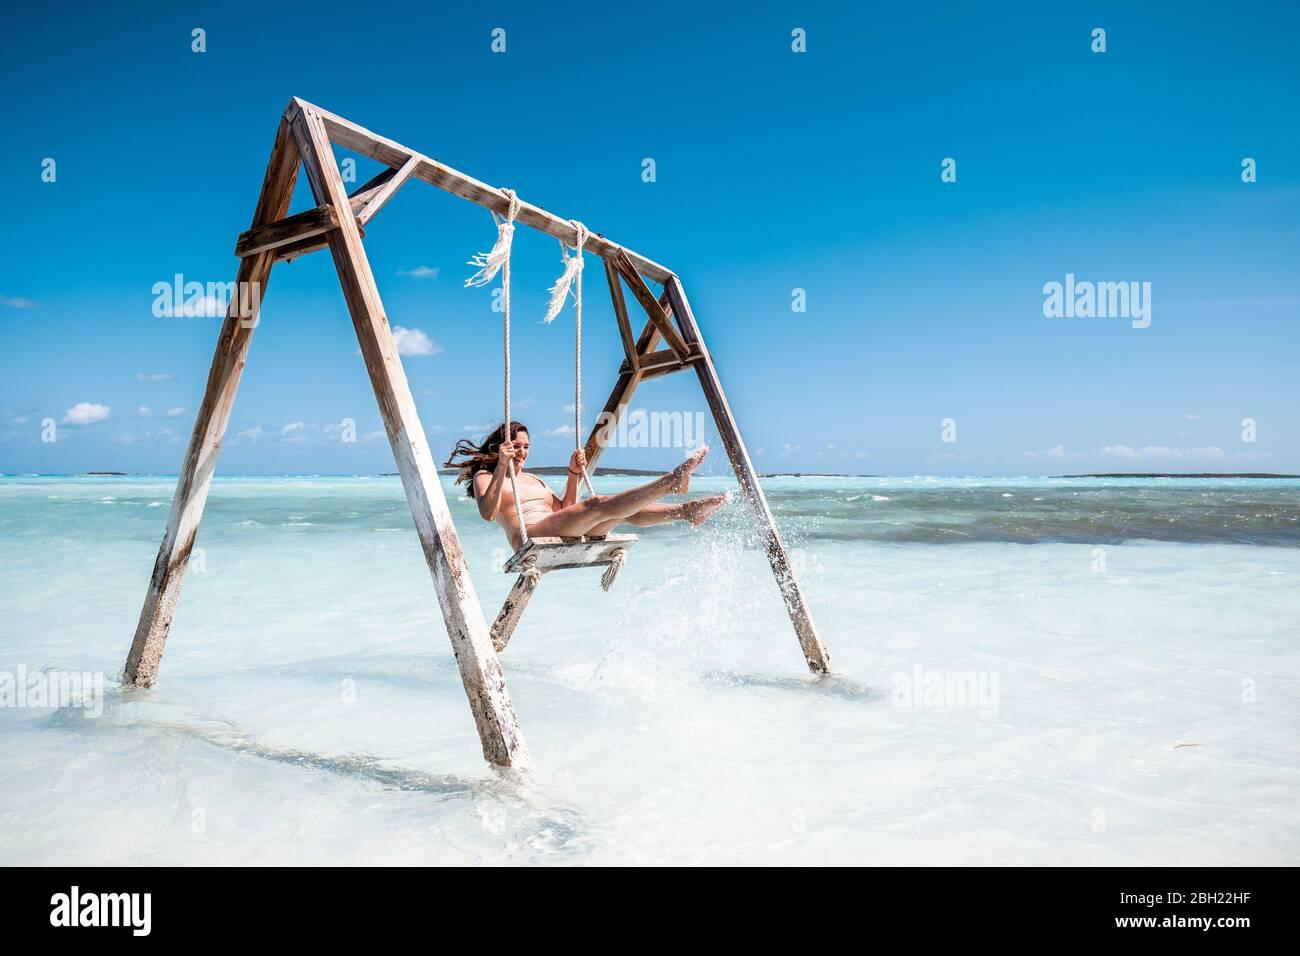 woman swinger in the bahamas